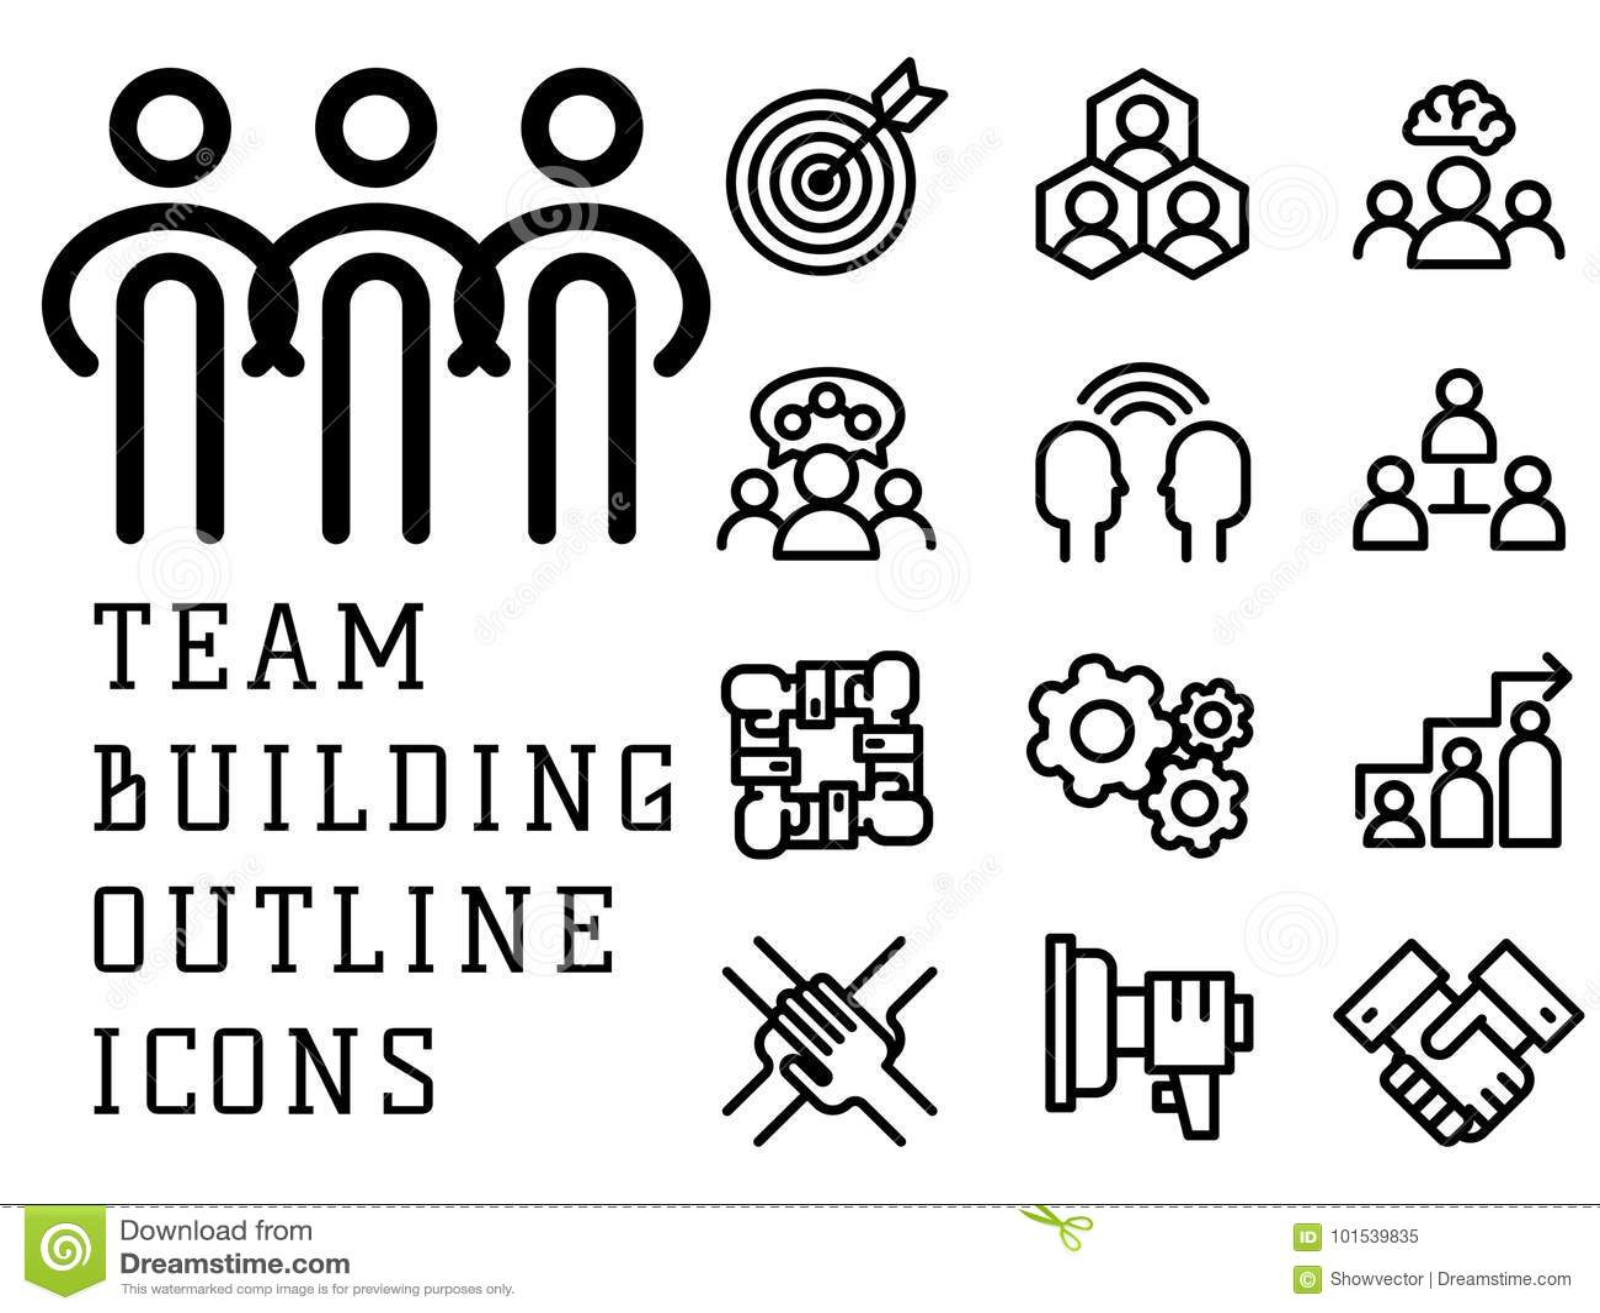 Teambuilding Cartoons, Illustrations & Vector Stock Images